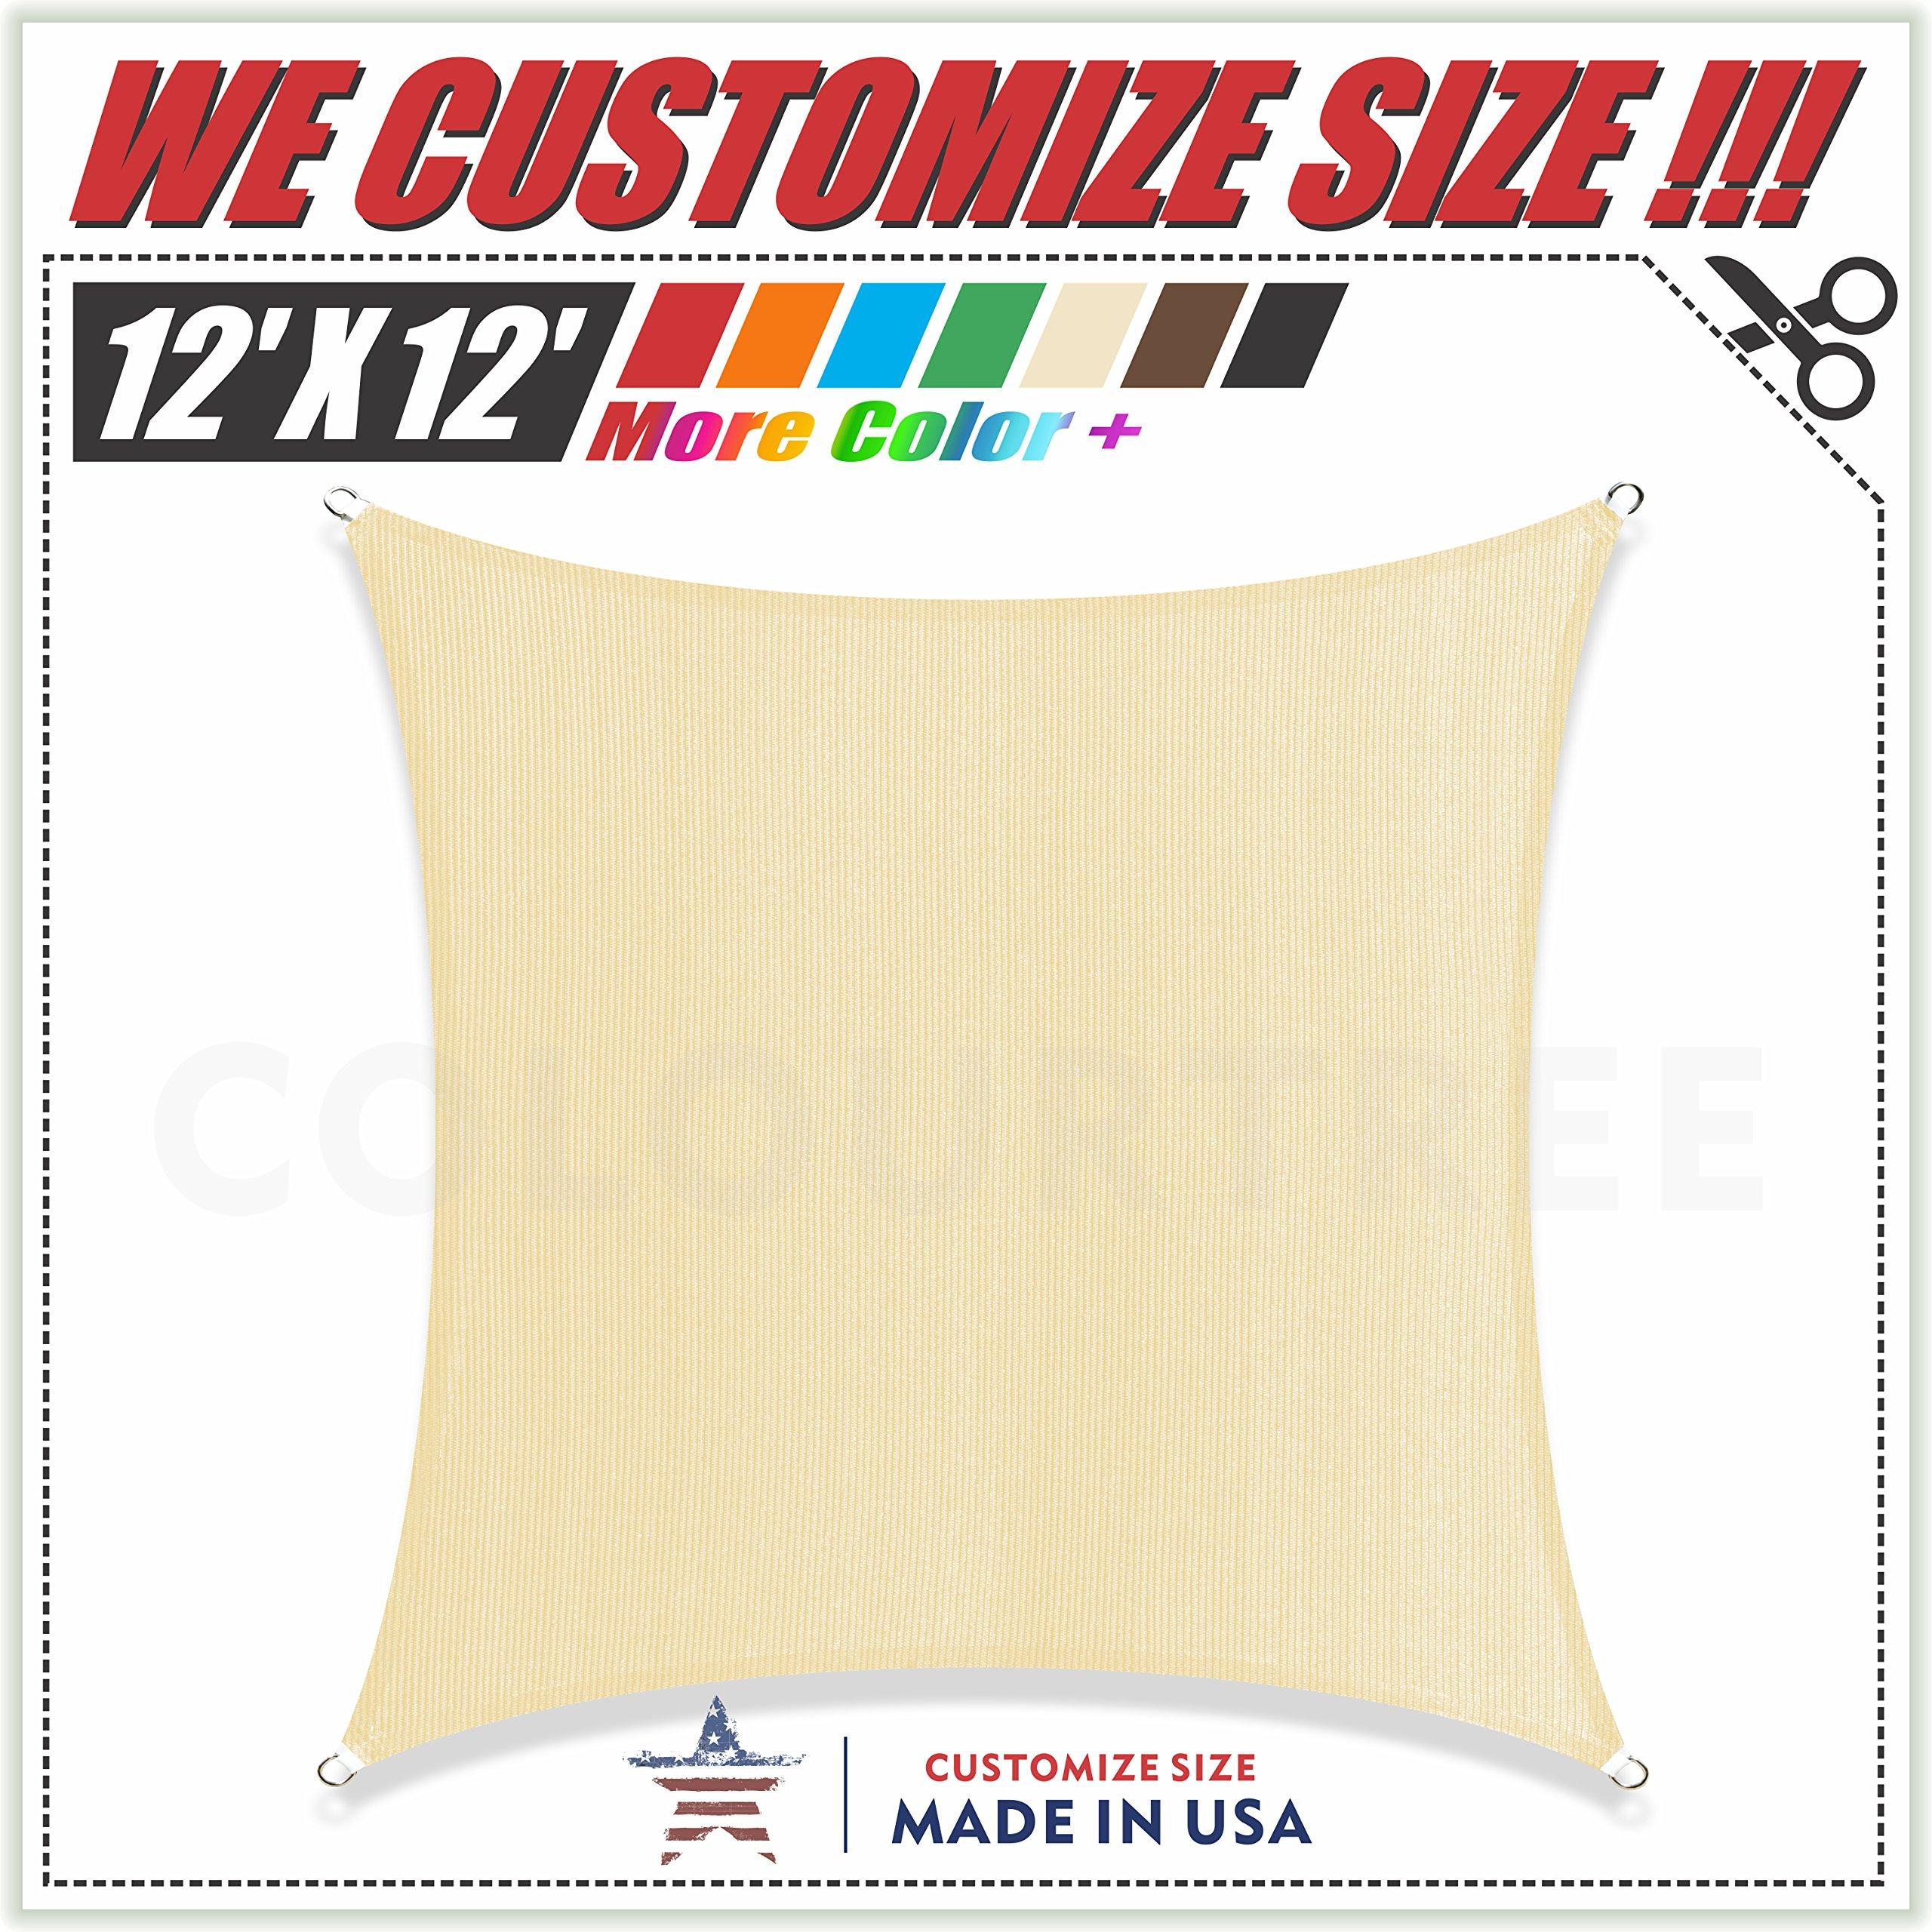 ColourTree 12' x 12' Beige Sun Shade Sail Square Canopy – UV Block UV Resistant Heavy Duty Commercial Grade Outdoor Patio Carport (CUSTOM SIZE AVAILABLE)